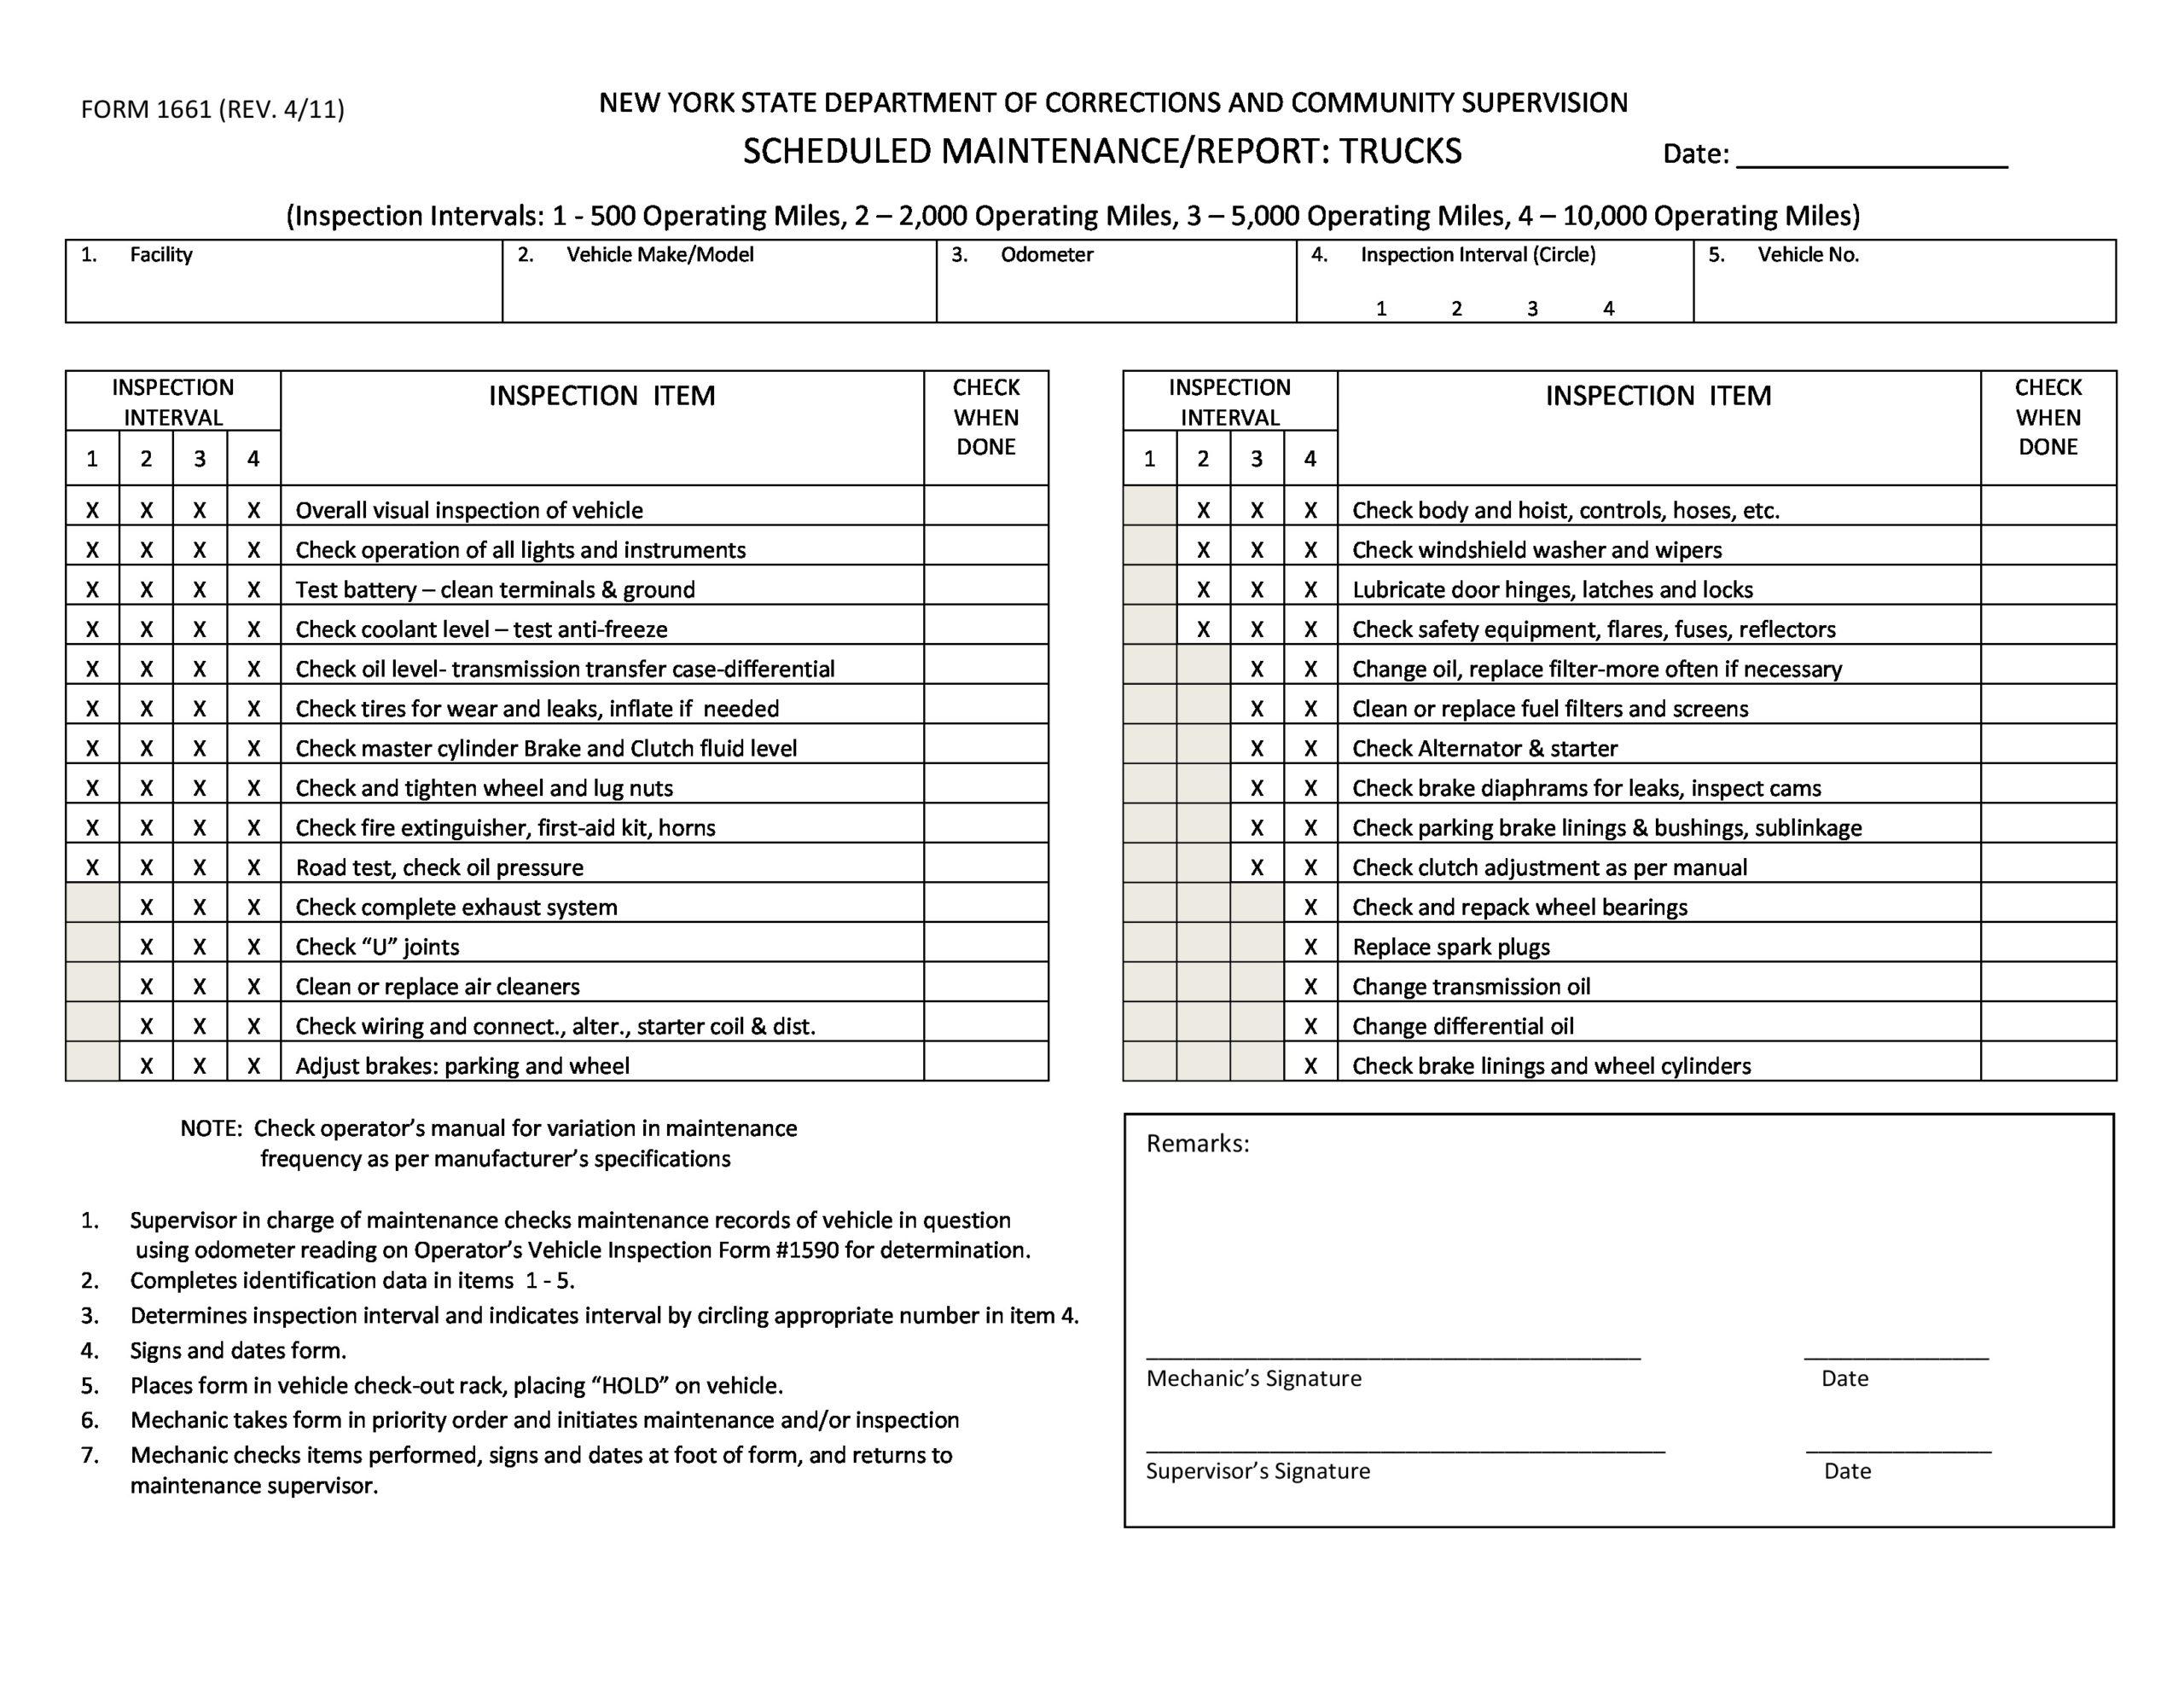 Free maintenance report form 47